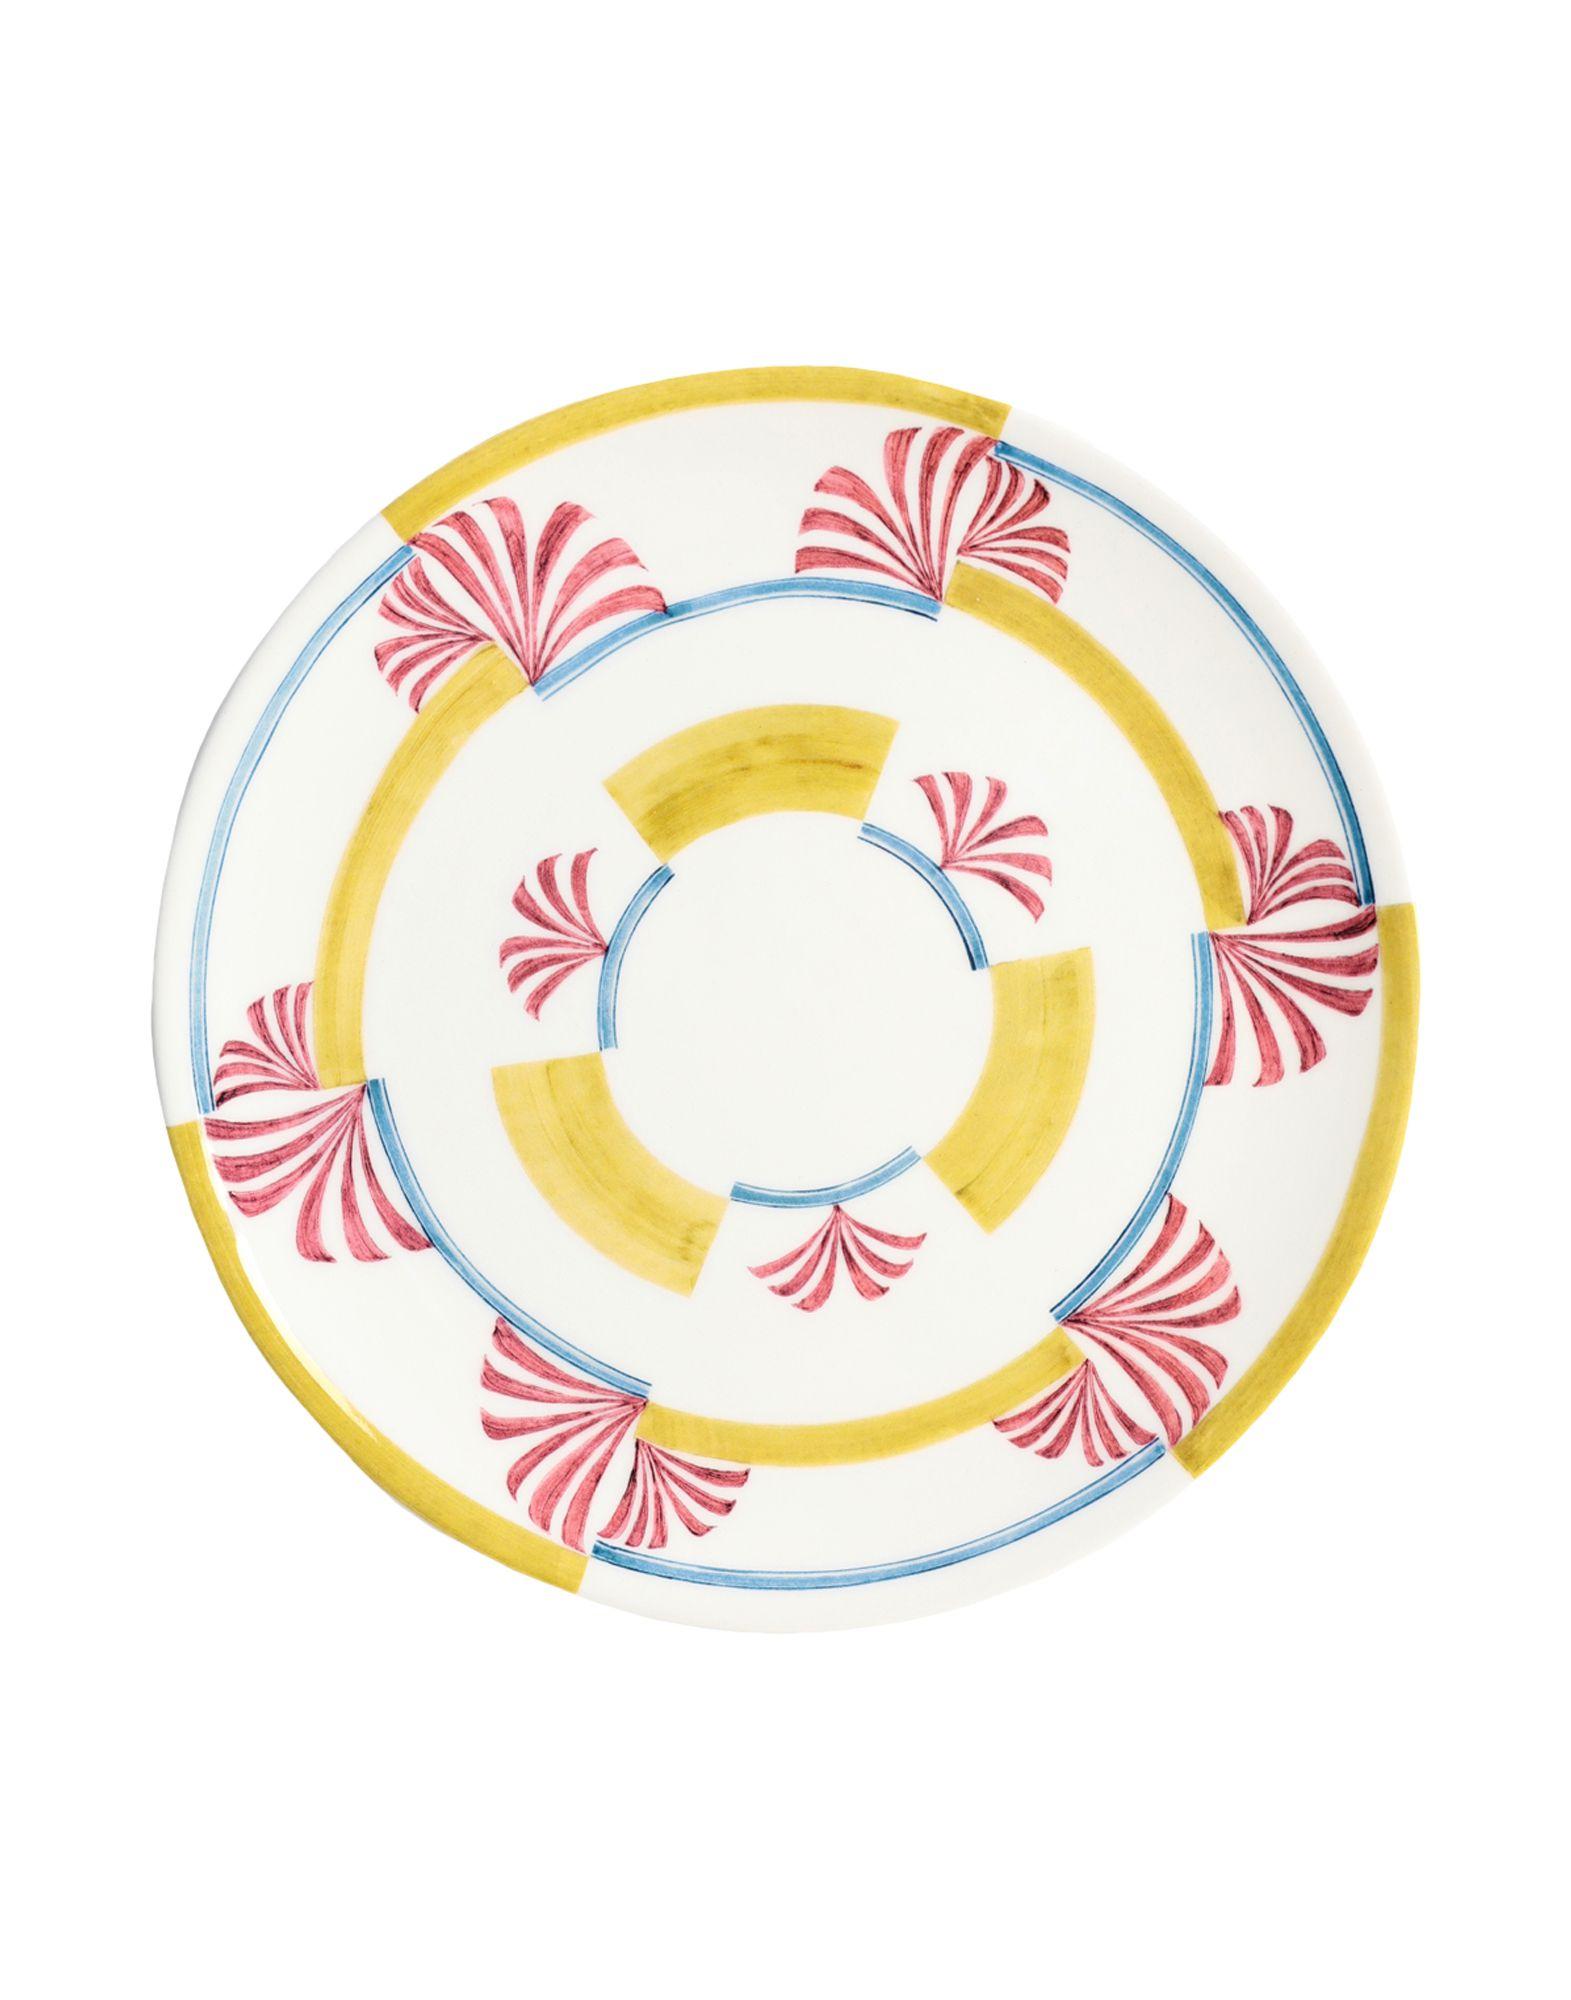 YOOX.COM(ユークス)《セール開催中》LABORATORIO PARAVICINI Unisex オーナメンタルプレート ホワイト 陶製